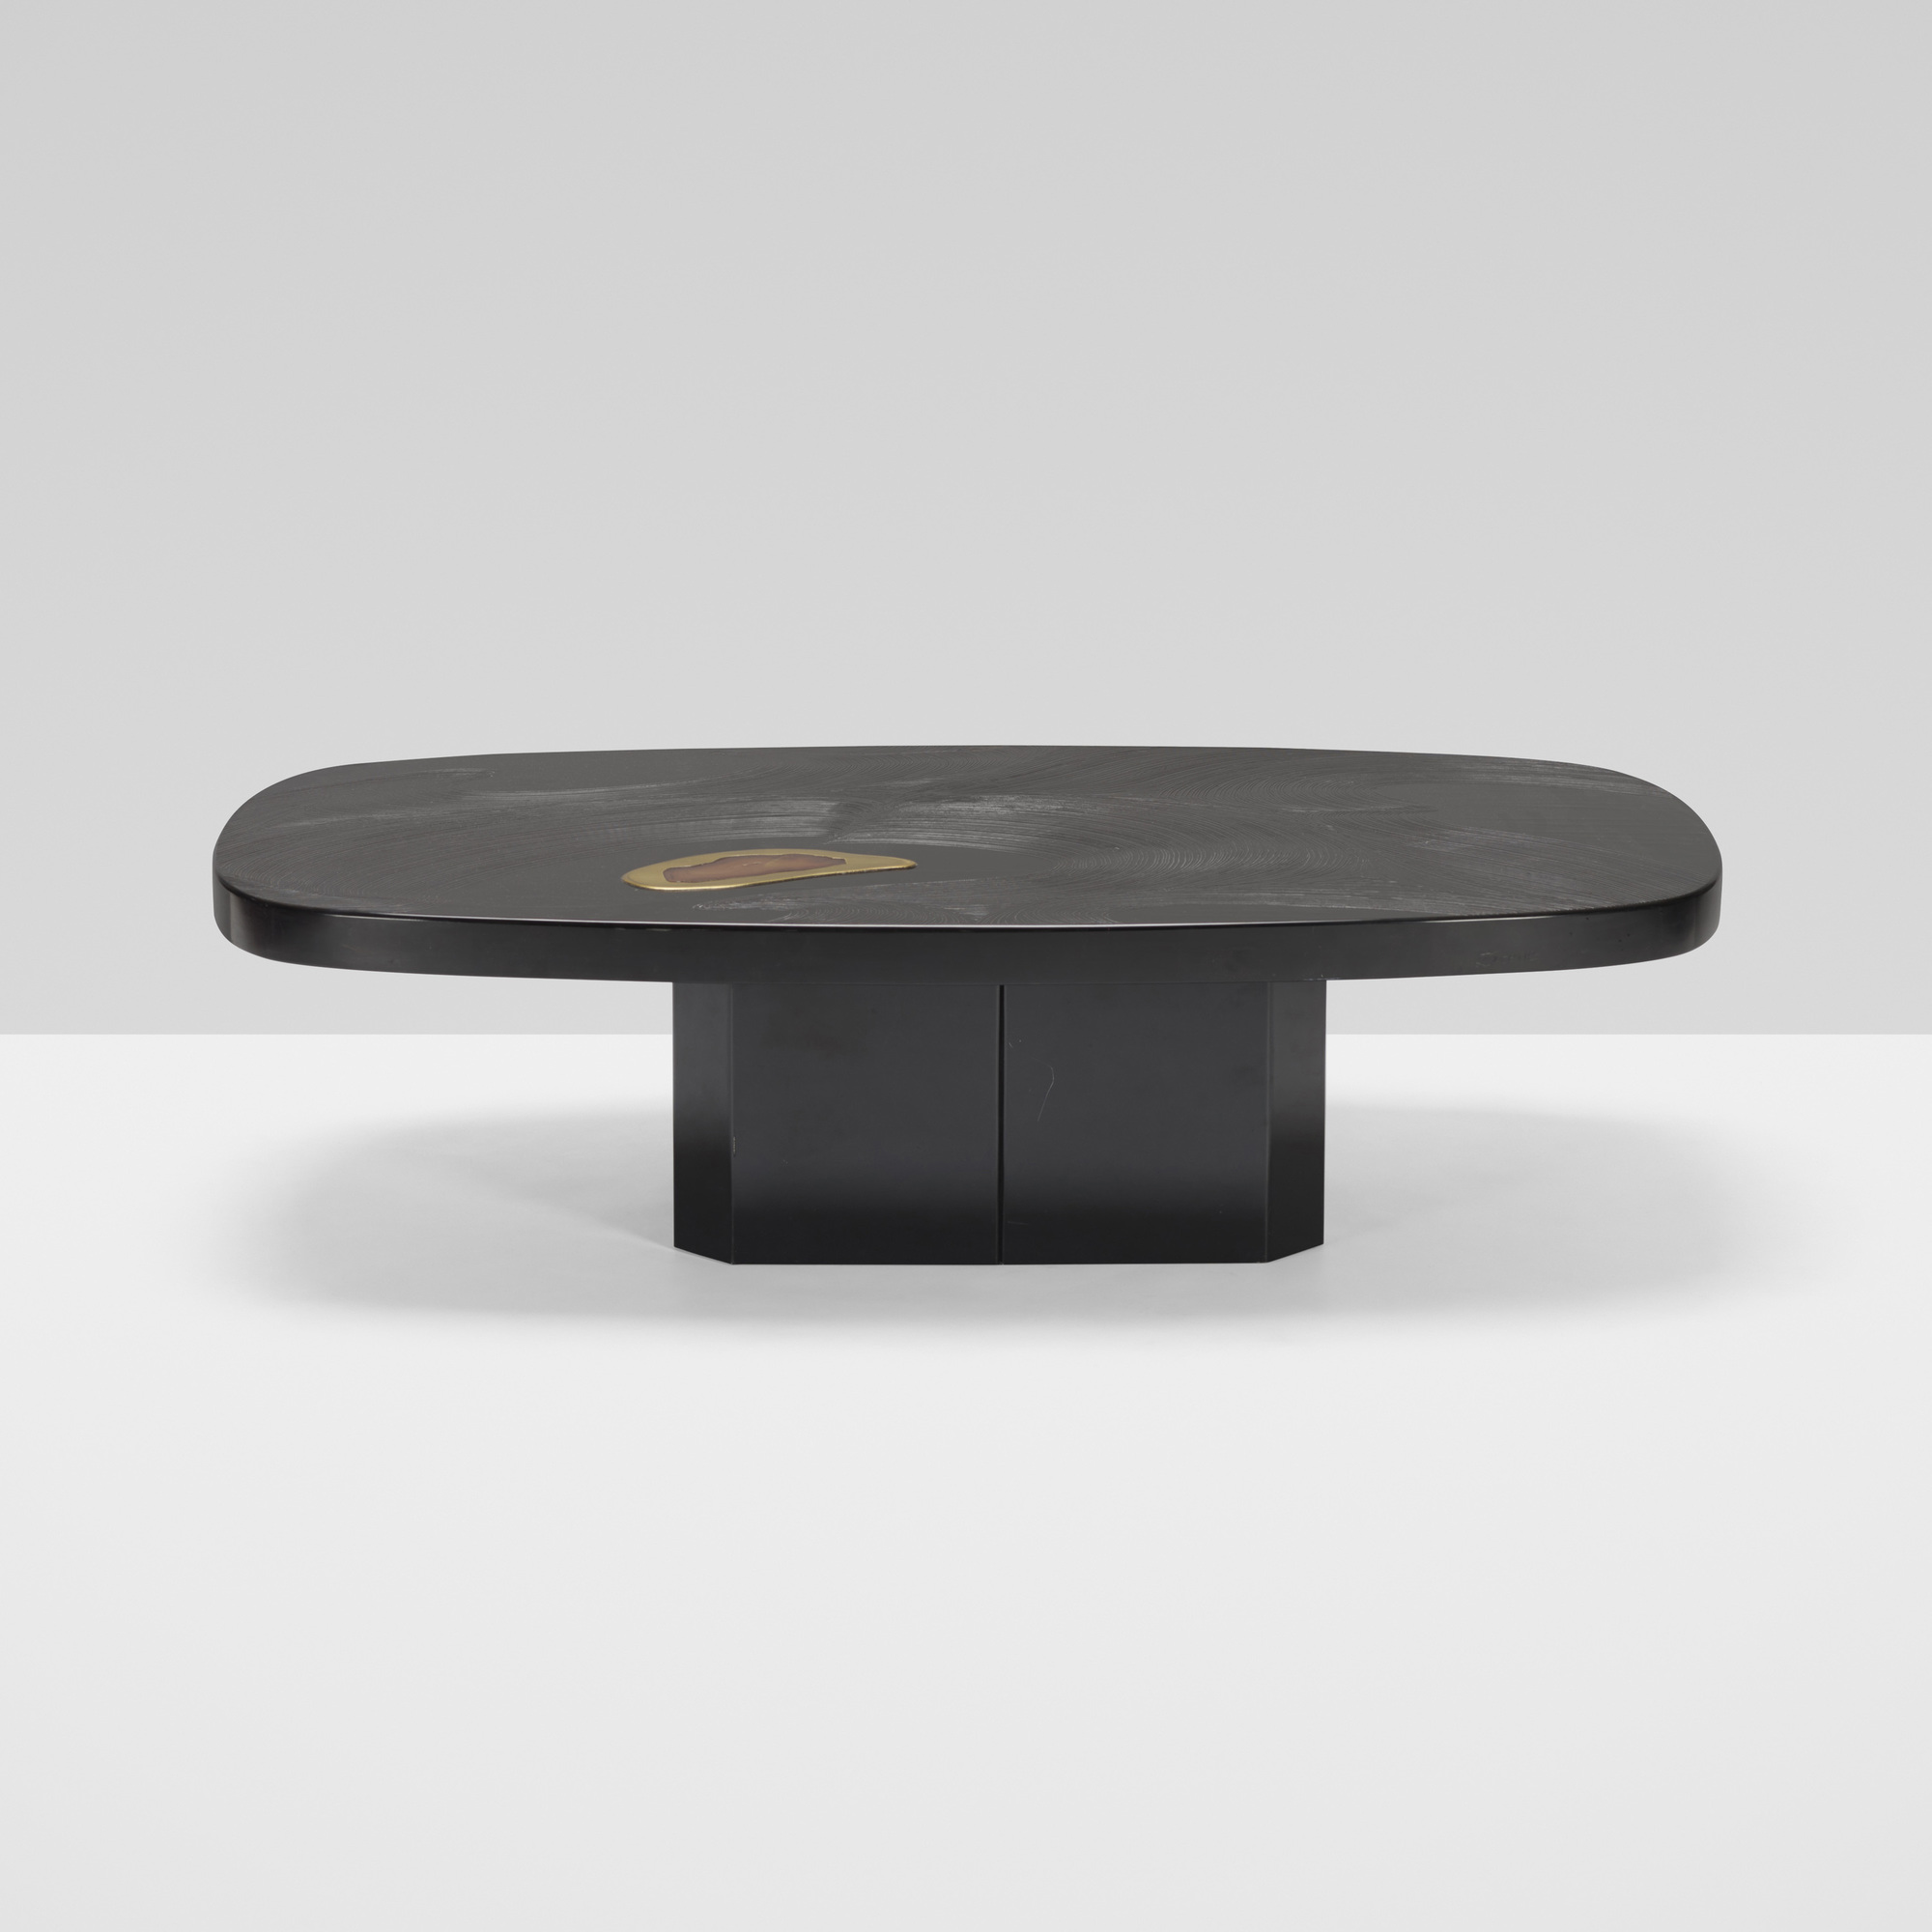 295: Jean Claude Dresse / coffee table (2 of 3)